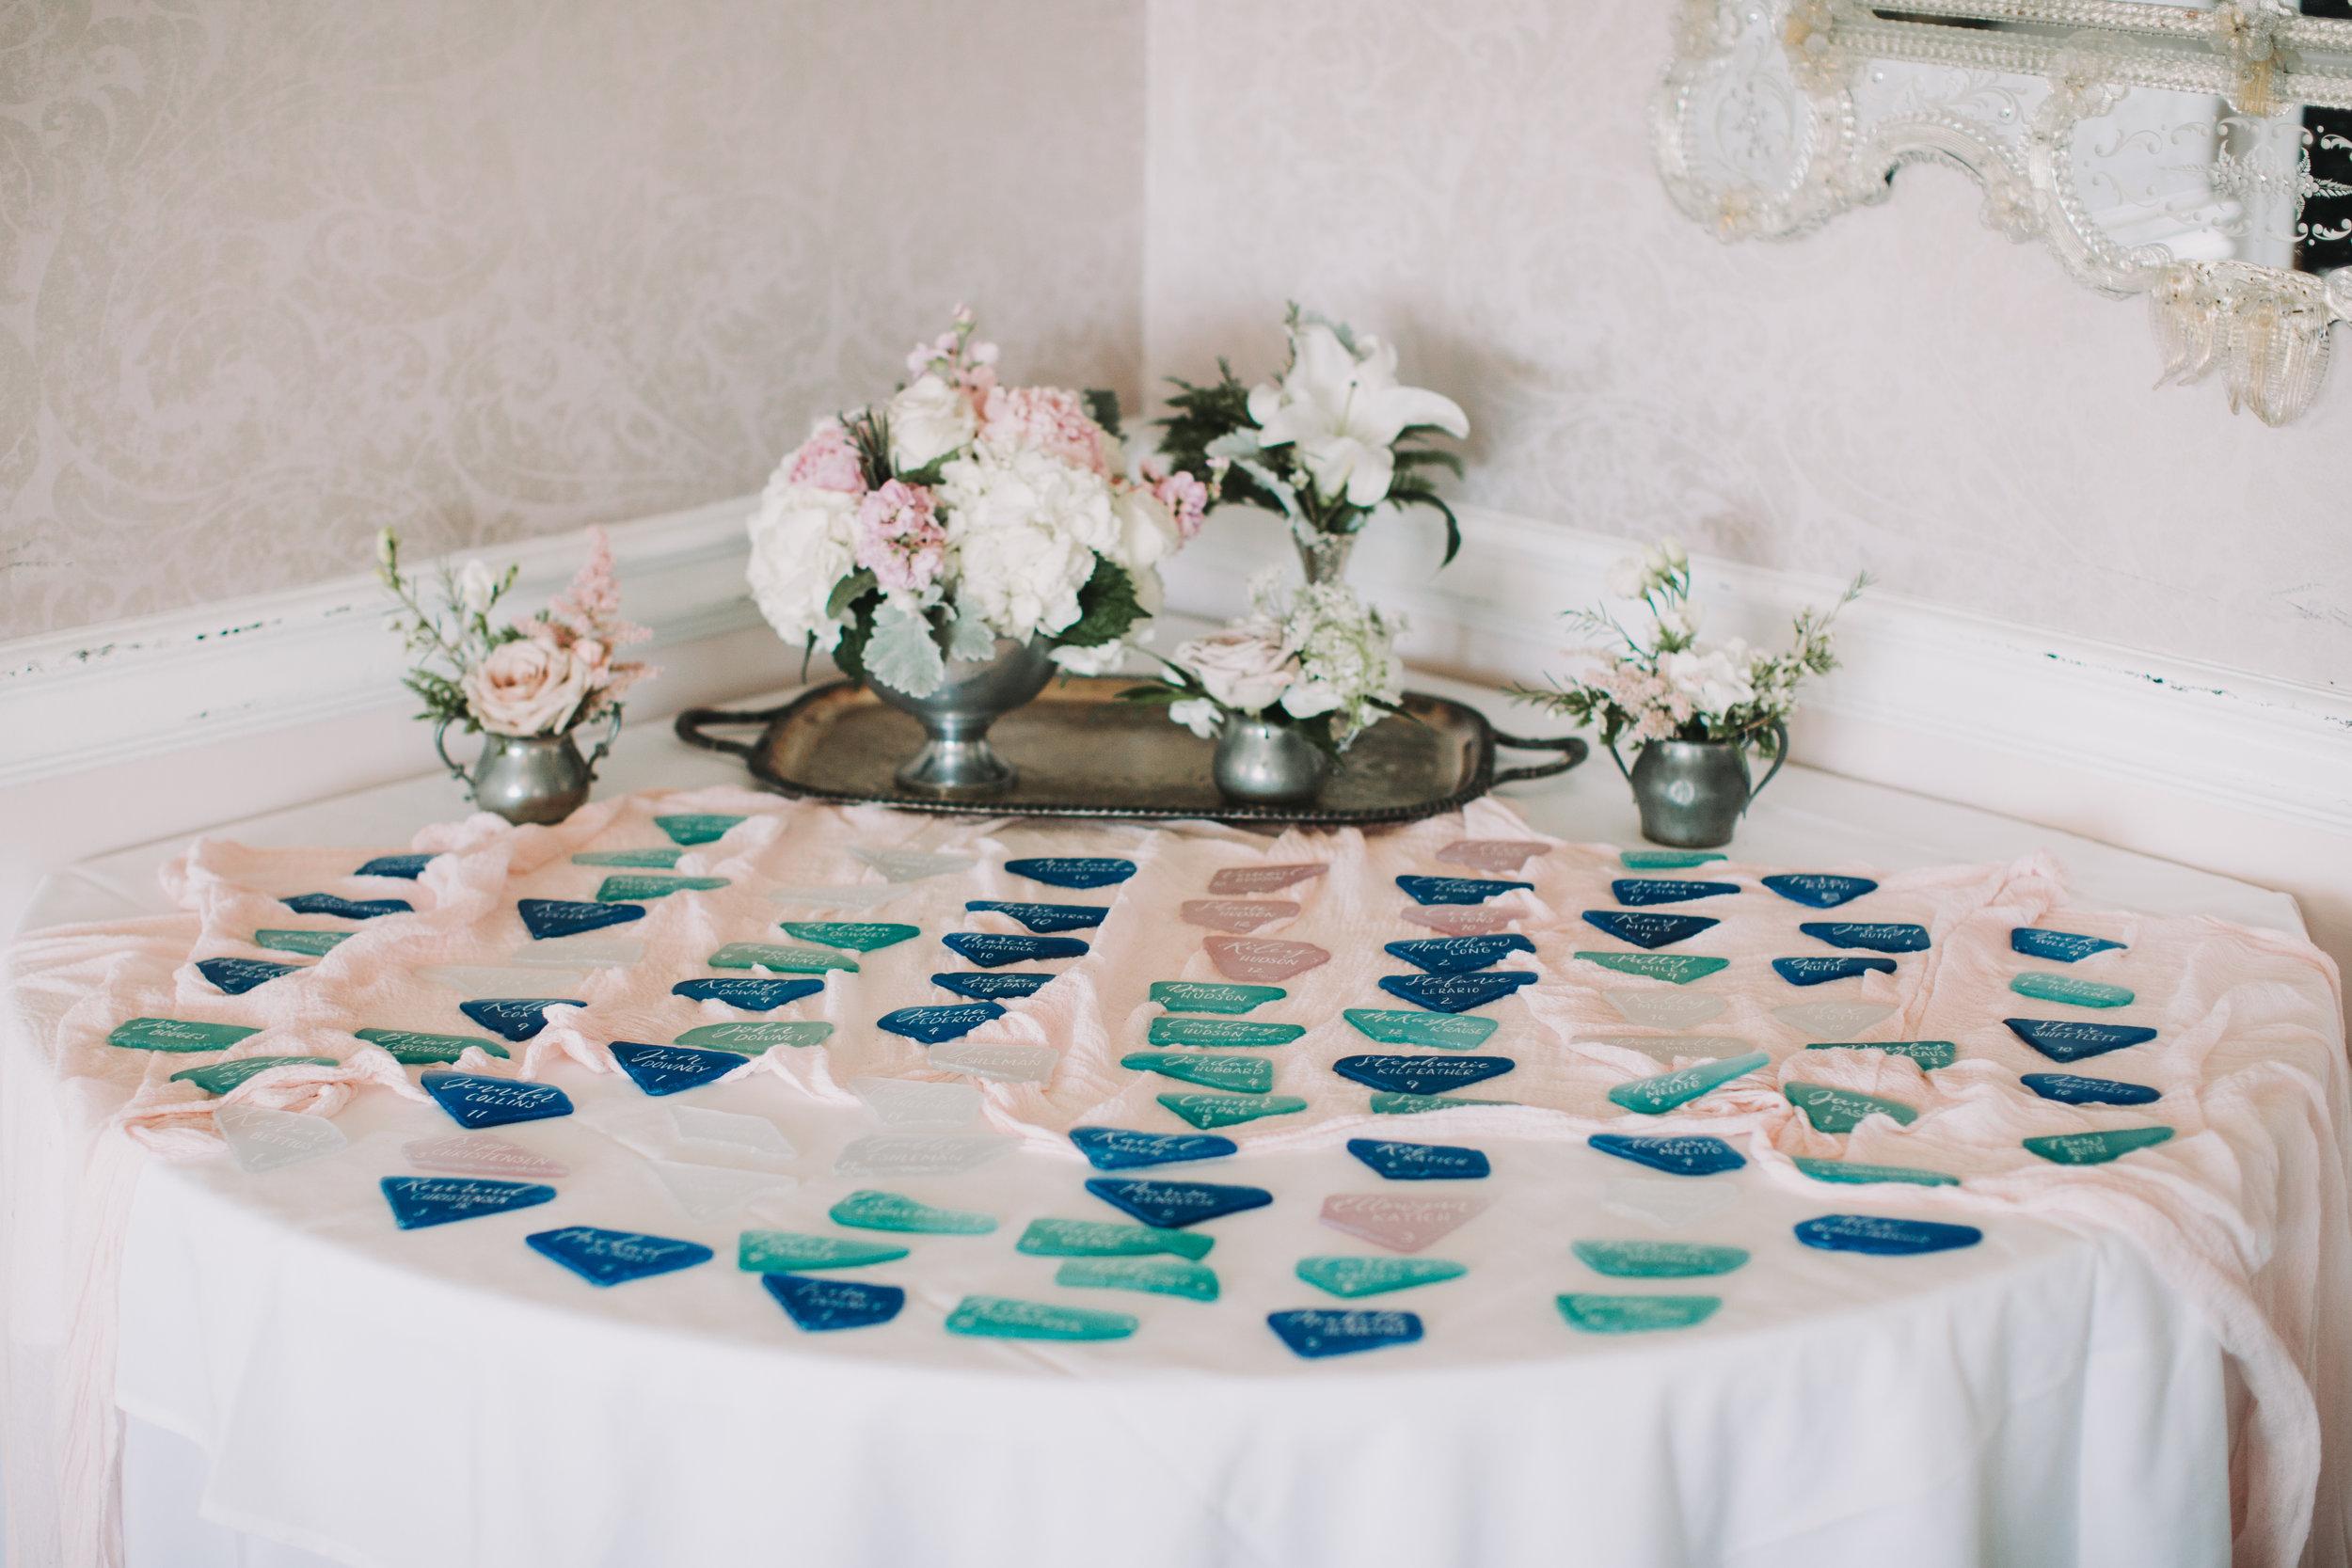 NJ Wedding, Seating Chart, Seating Assignments, Wedding Inspo, A Garden Party, Beach Wedding, Sea Glass Escort Cards